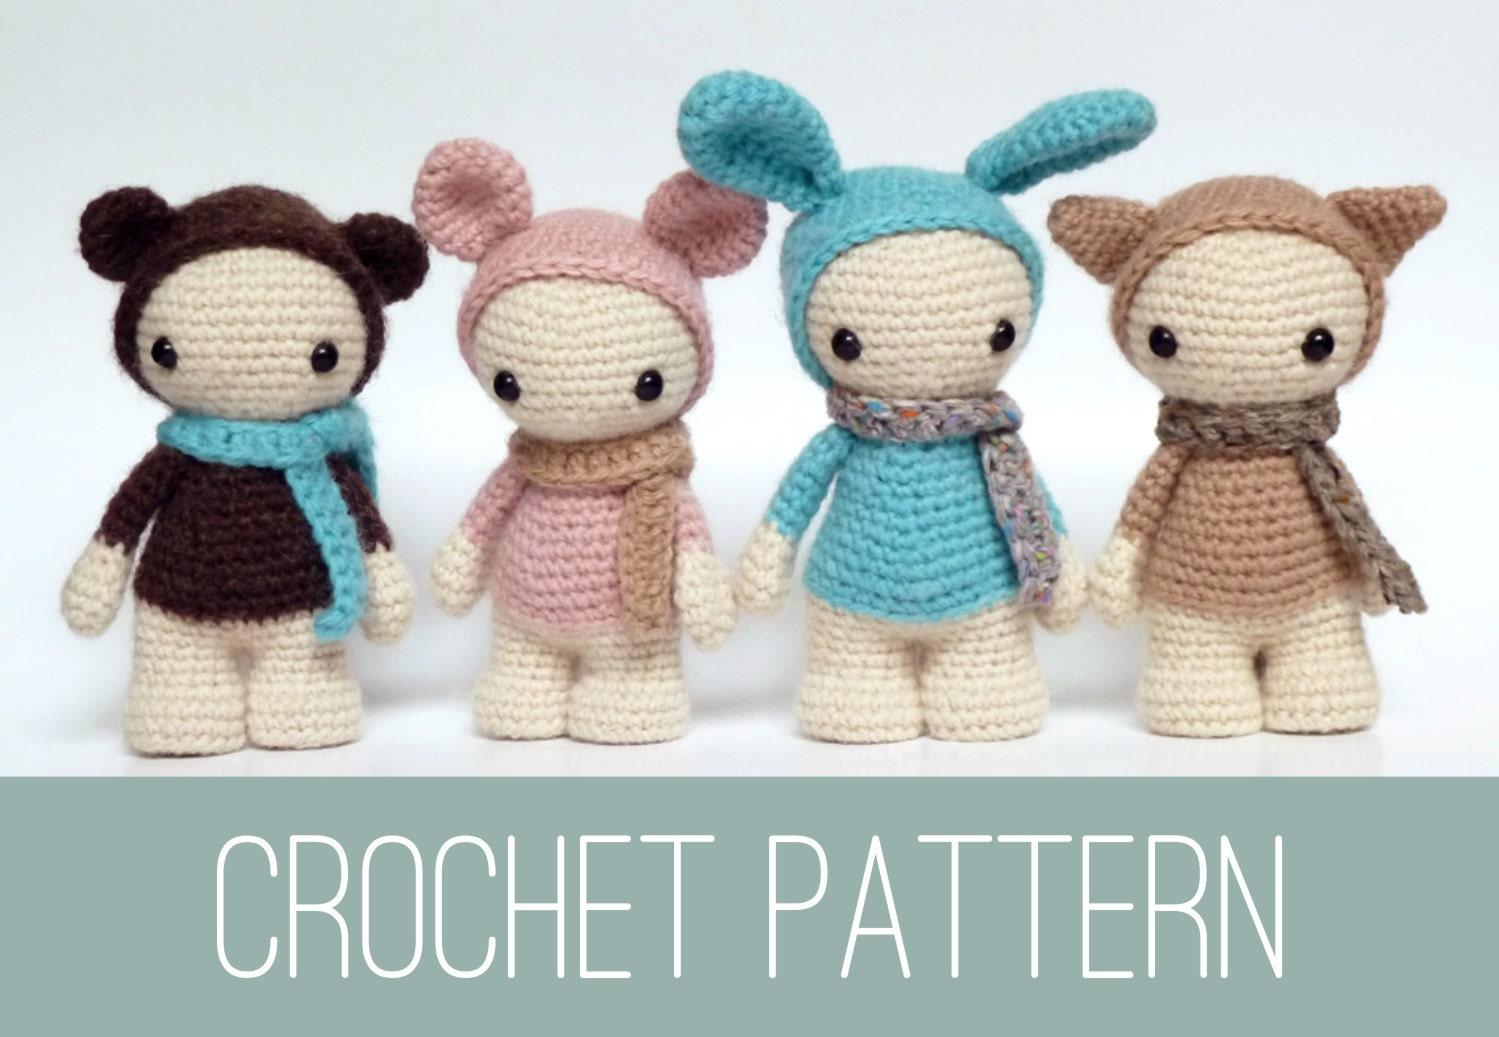 Amigurumi Doll Free Crochet Pattern : Amigurumi doll crochet pattern crochet dolls pattern